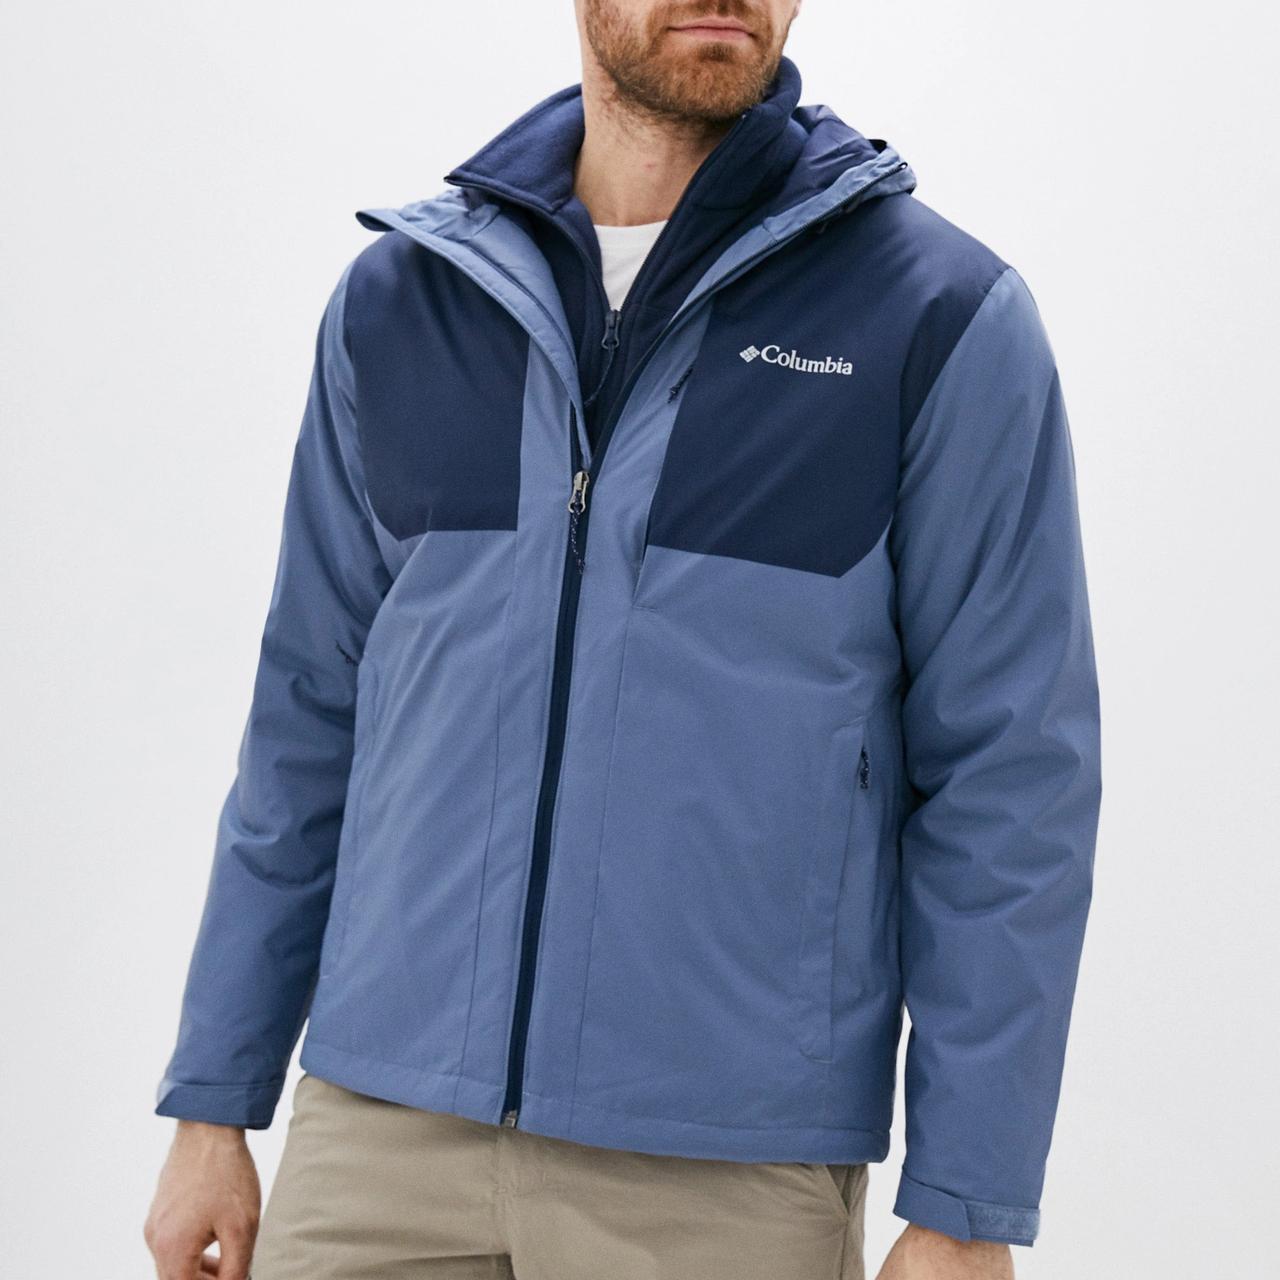 Демисезонная мужская куртка Columbia Straight Line